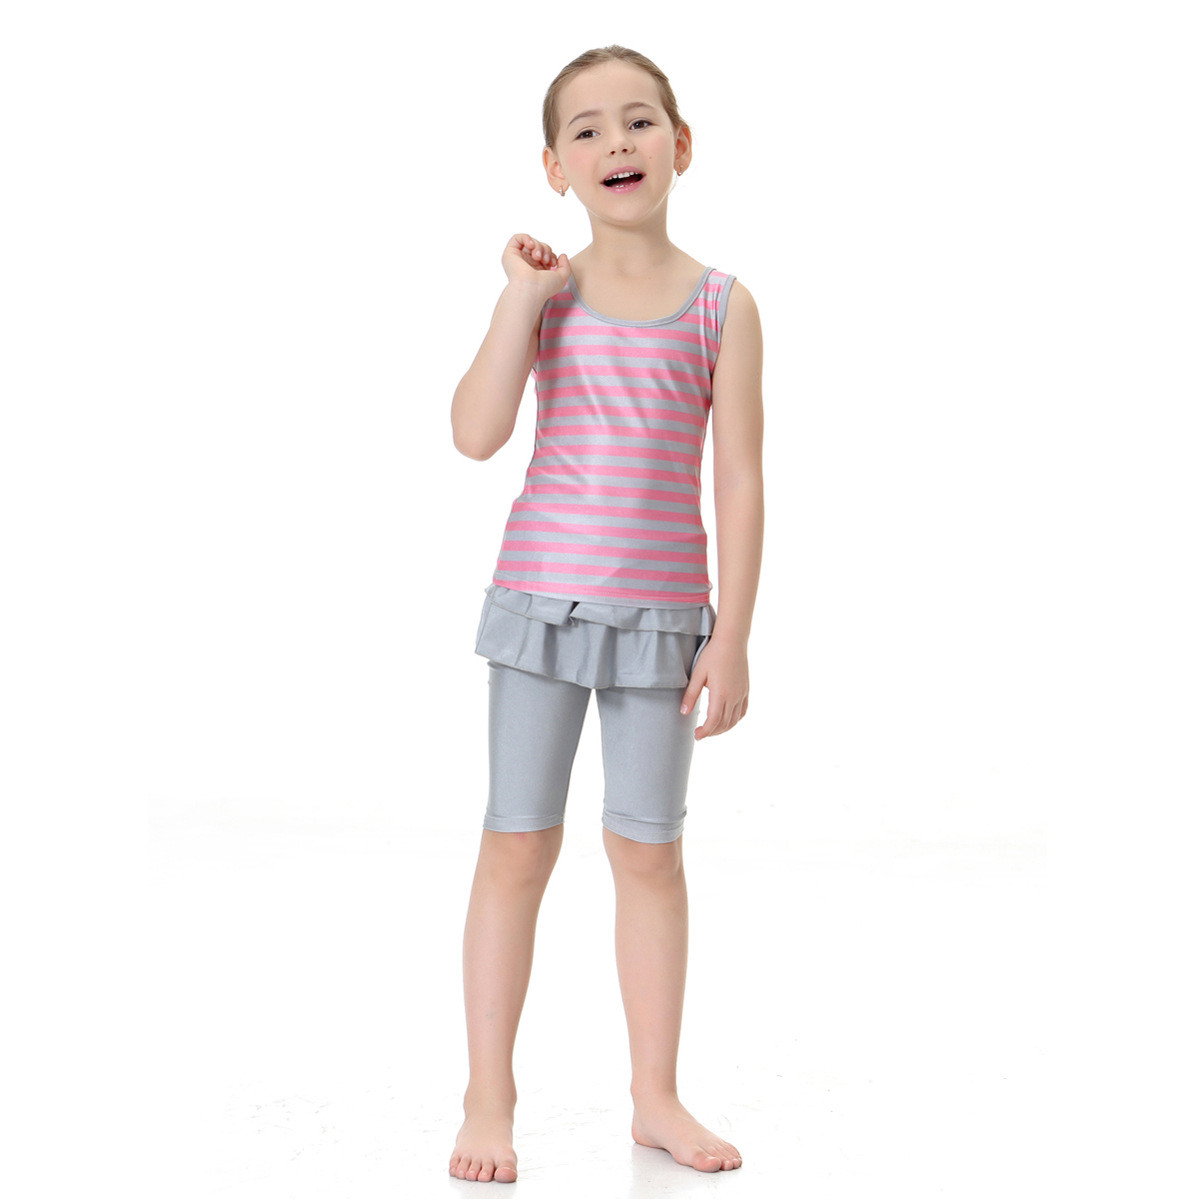 Muslim Hui Nationality GIRL'S Swimsuit Conservative Split Type Swimming Suit, Hw20c, AliExpress EBay Hot Selling